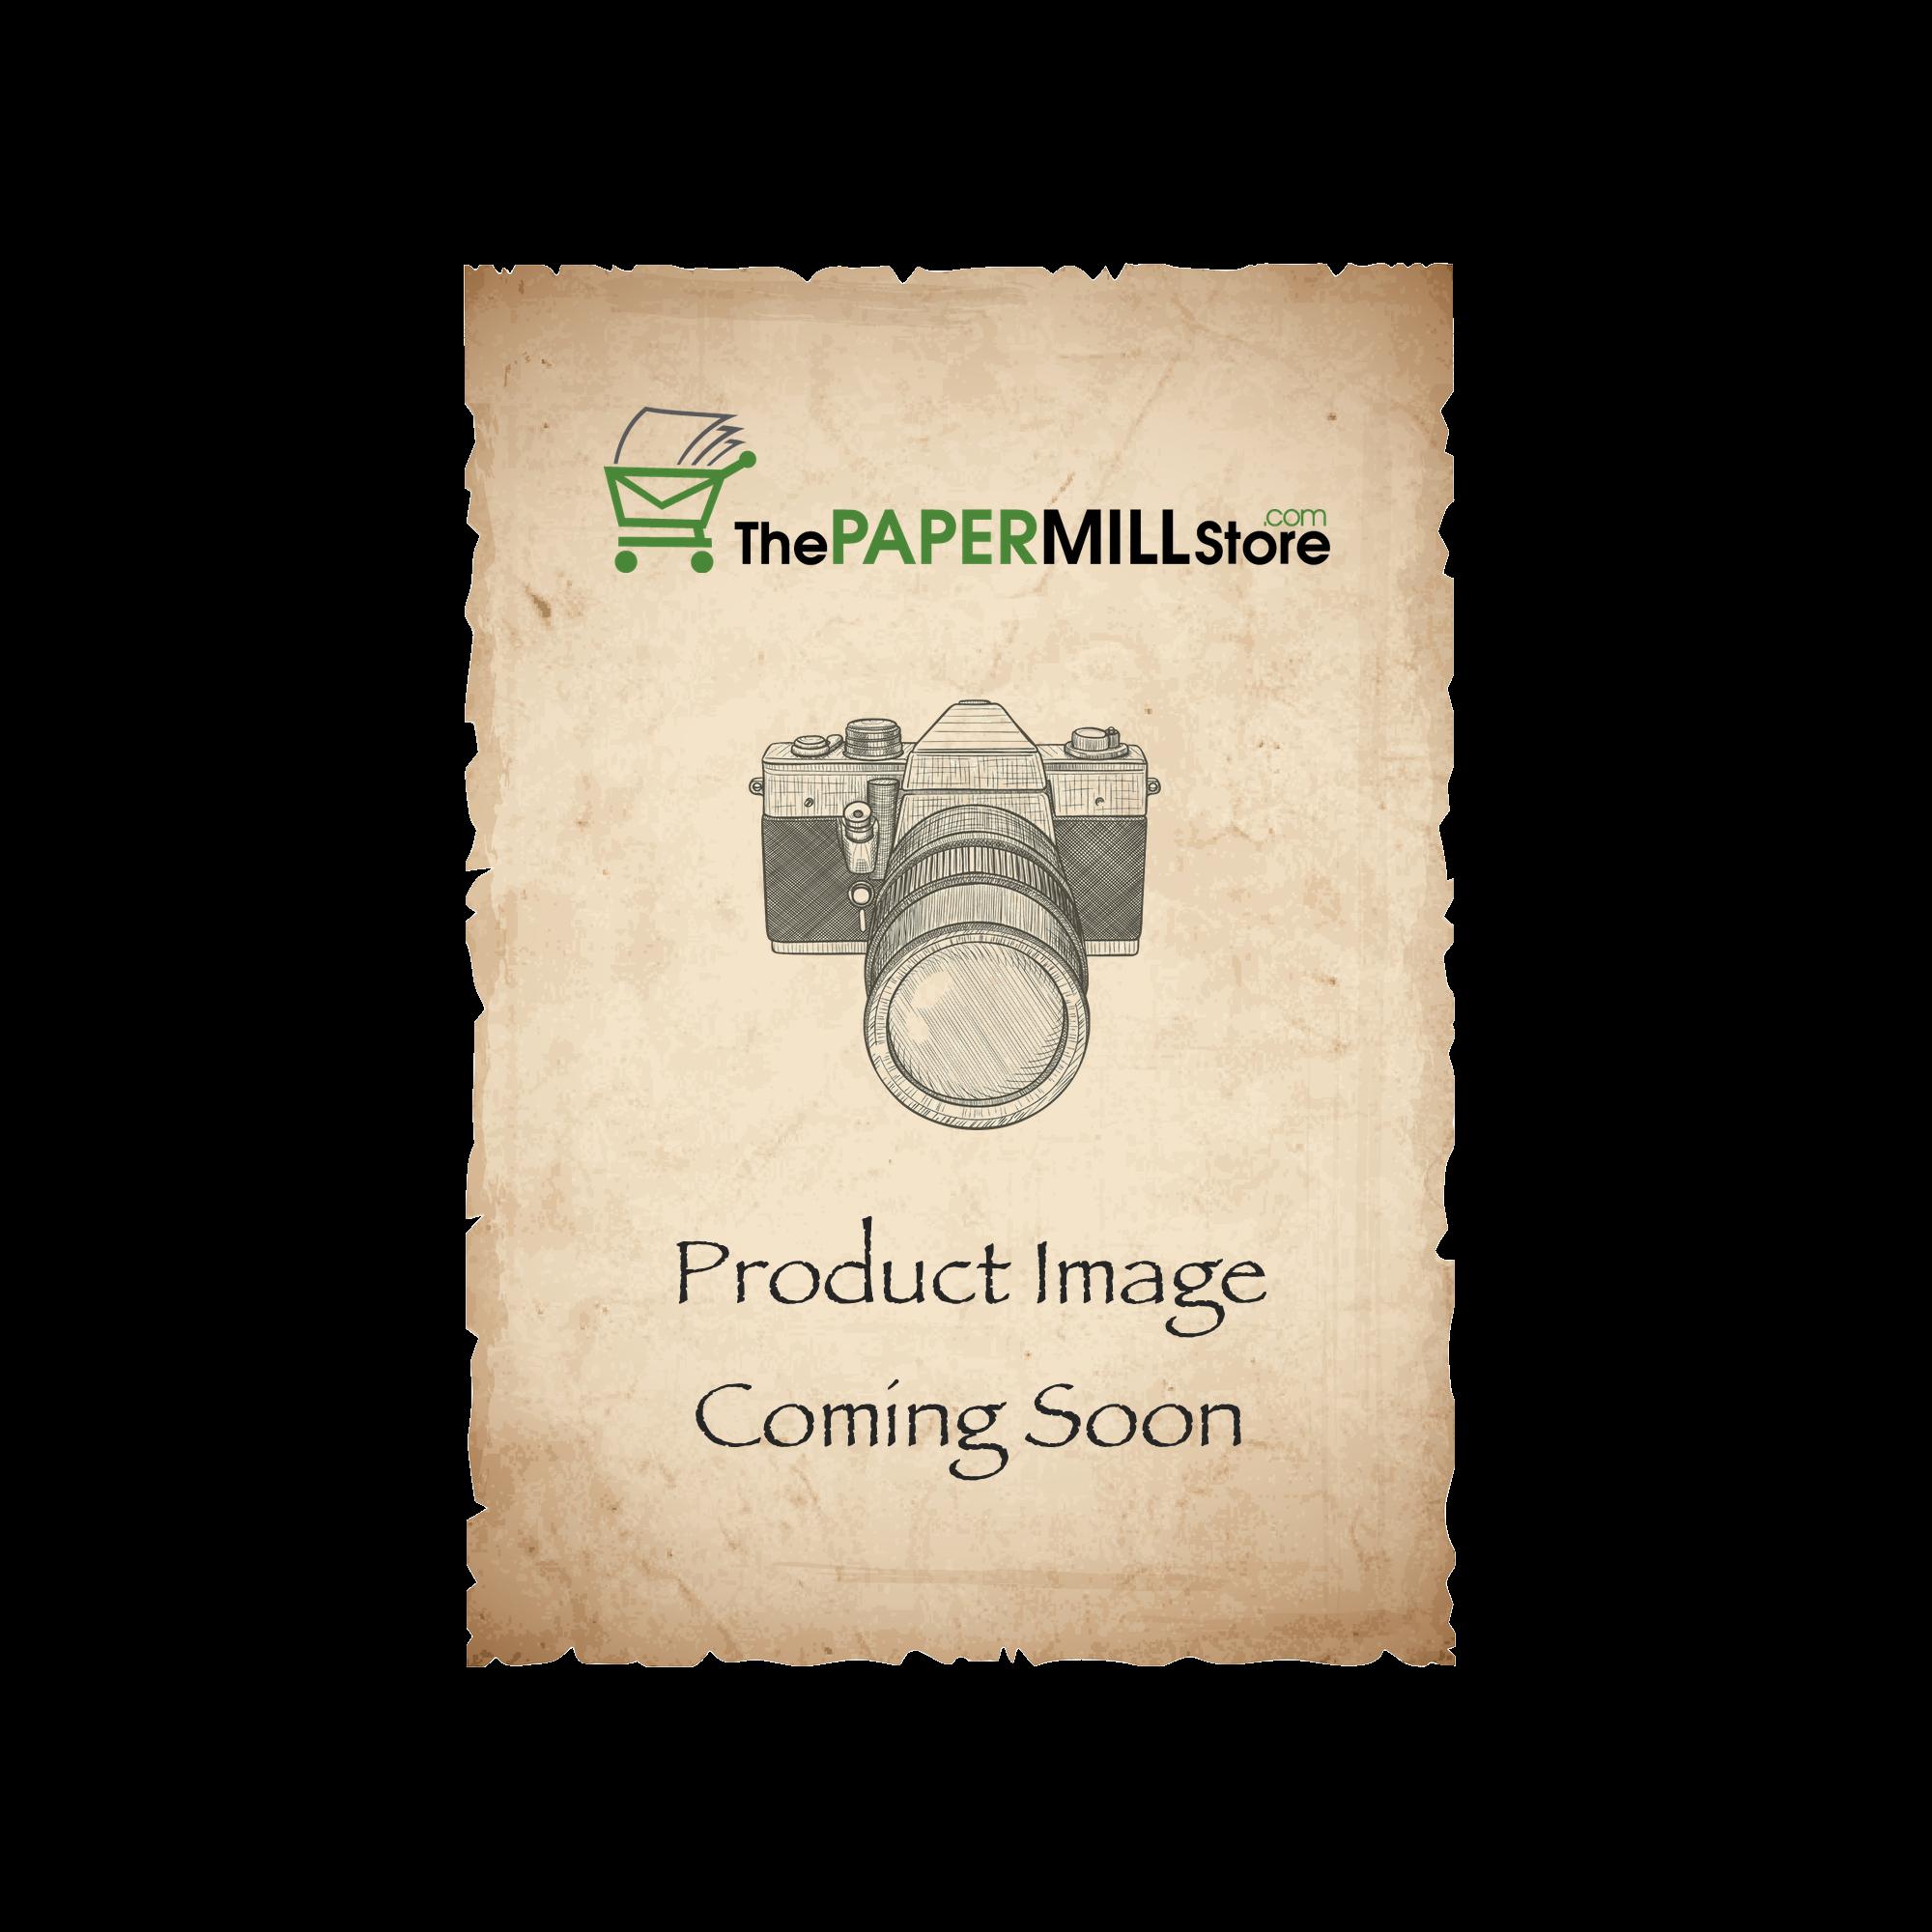 Ultrafelt Dove Gray Envelopes - A7 (5 1/4 x 7 1/4) 80 lb Text Premium Felt  30% Recycled 250 per Box